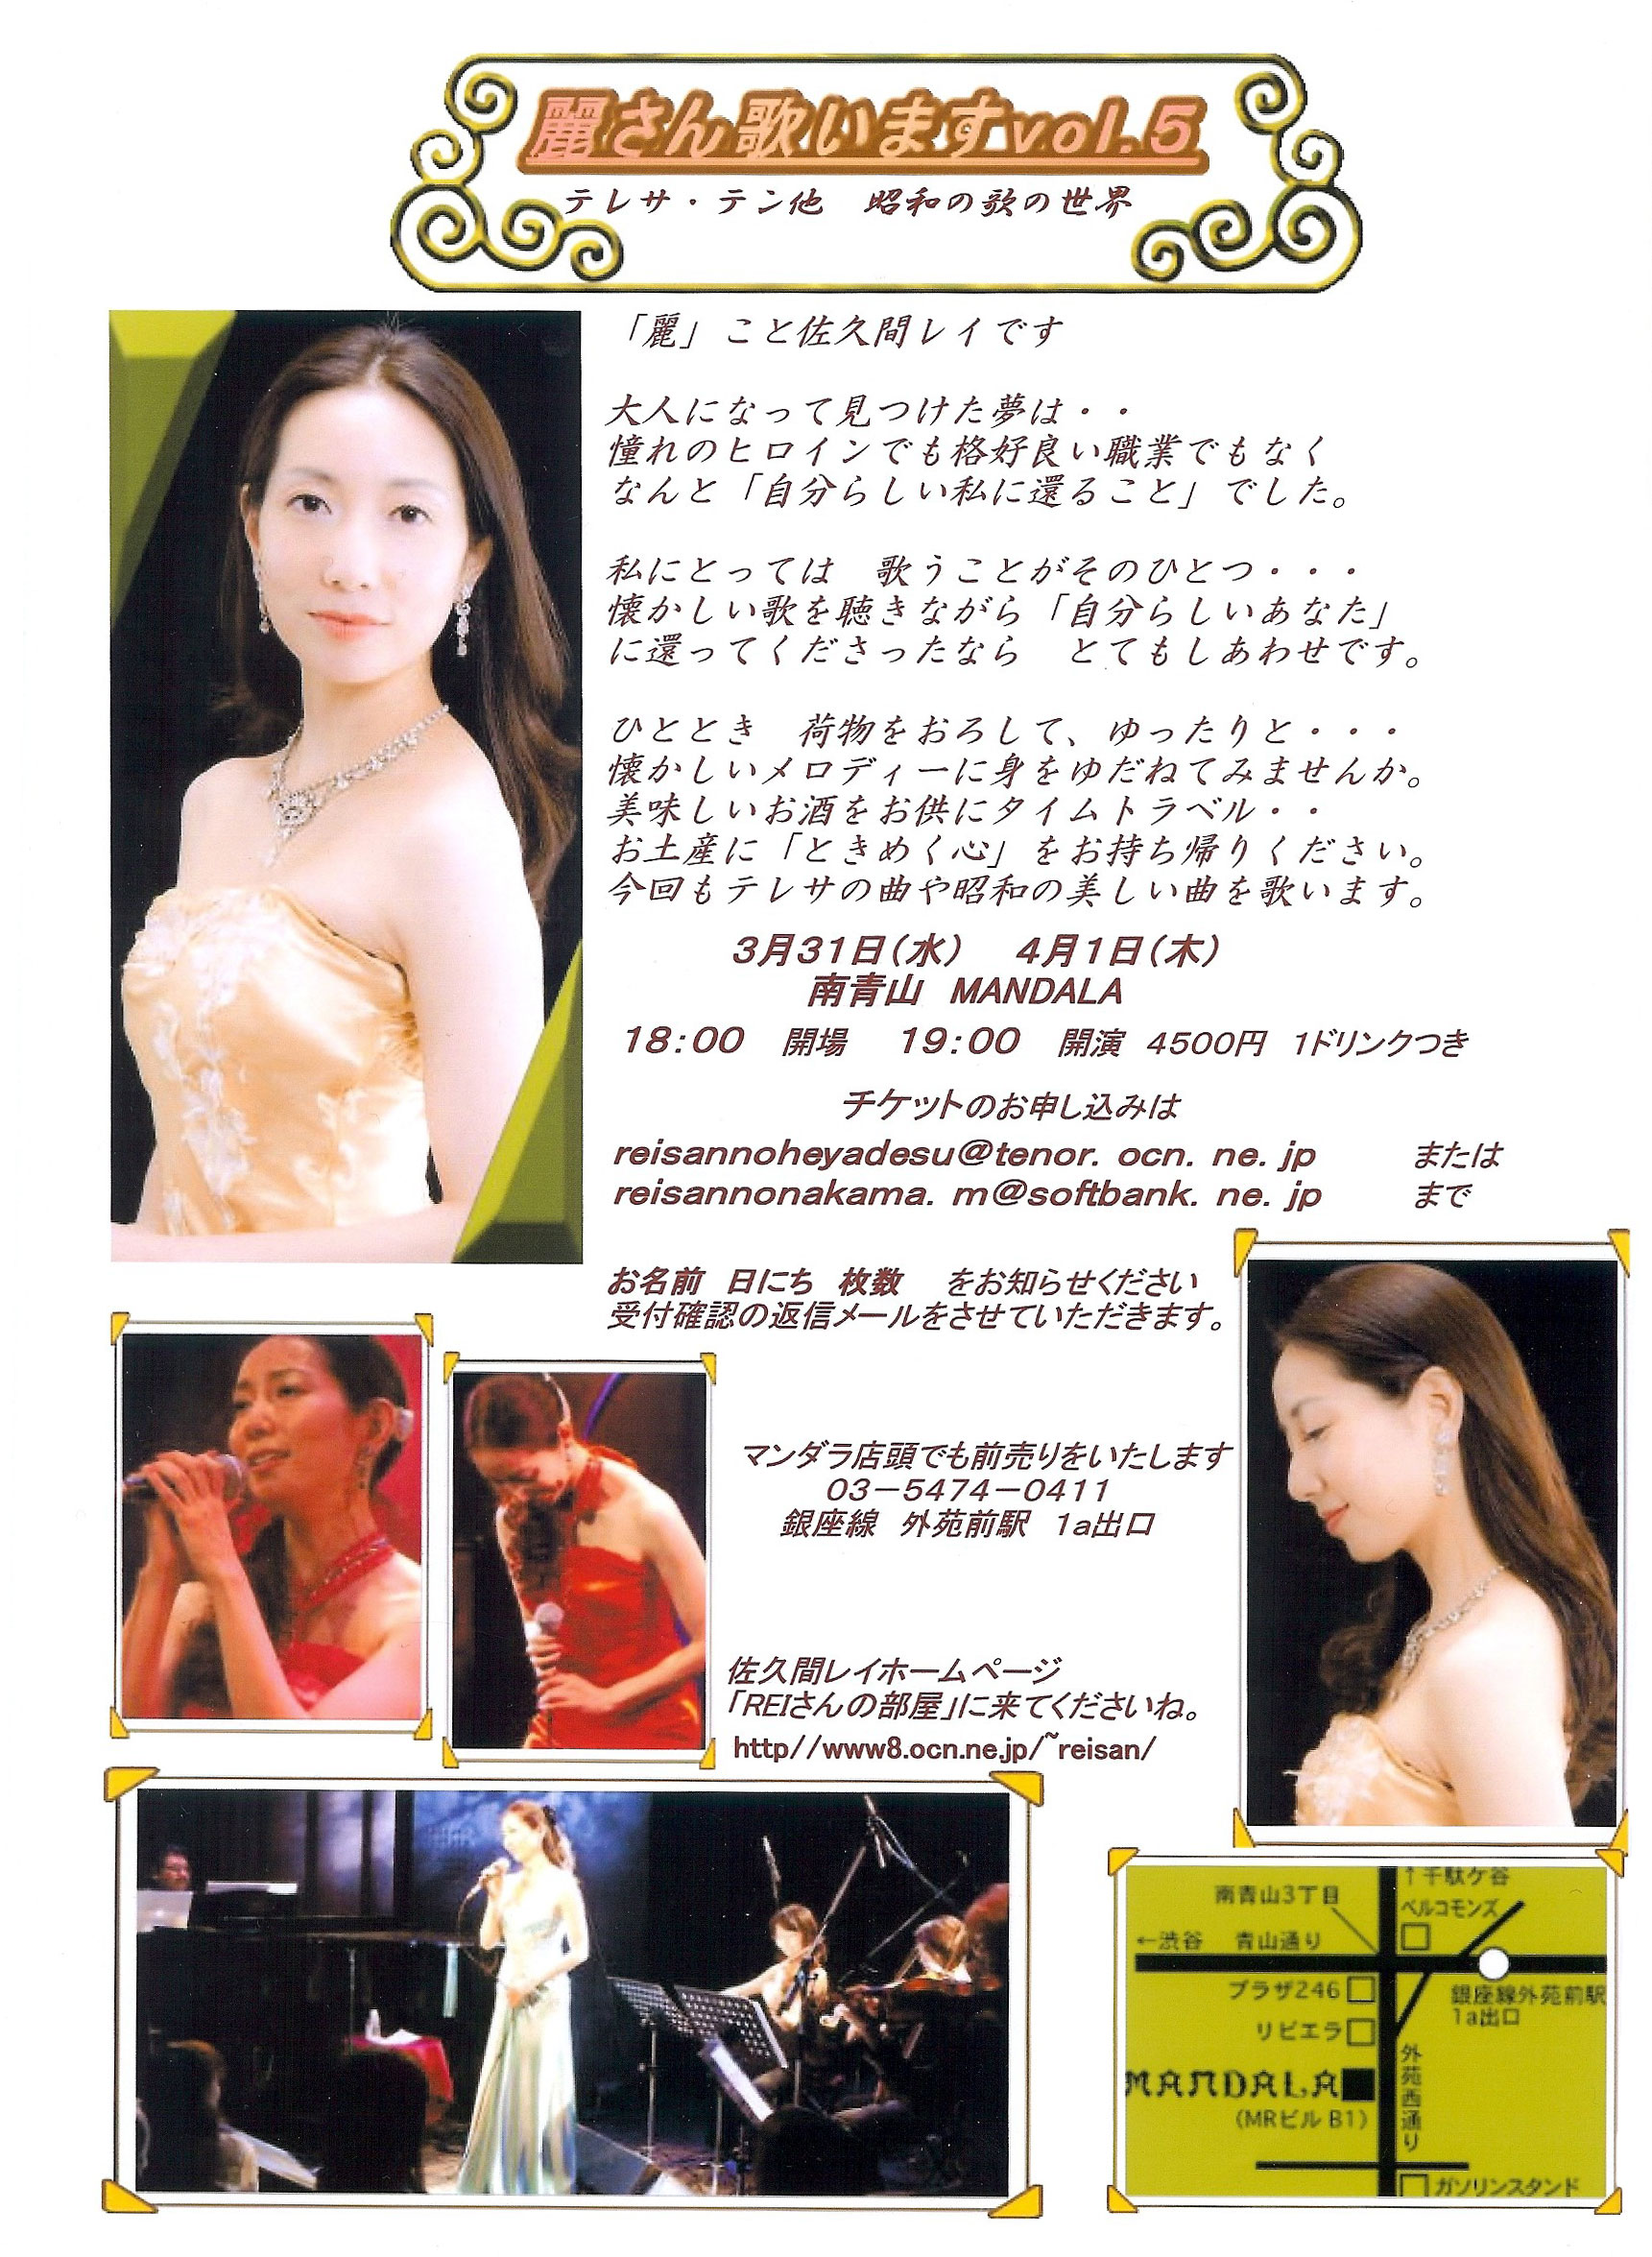 http://yamahirakenji.info/music/%E3%82%B9%E3%82%AD%E3%83%A3%E3%83%B30002.jpg